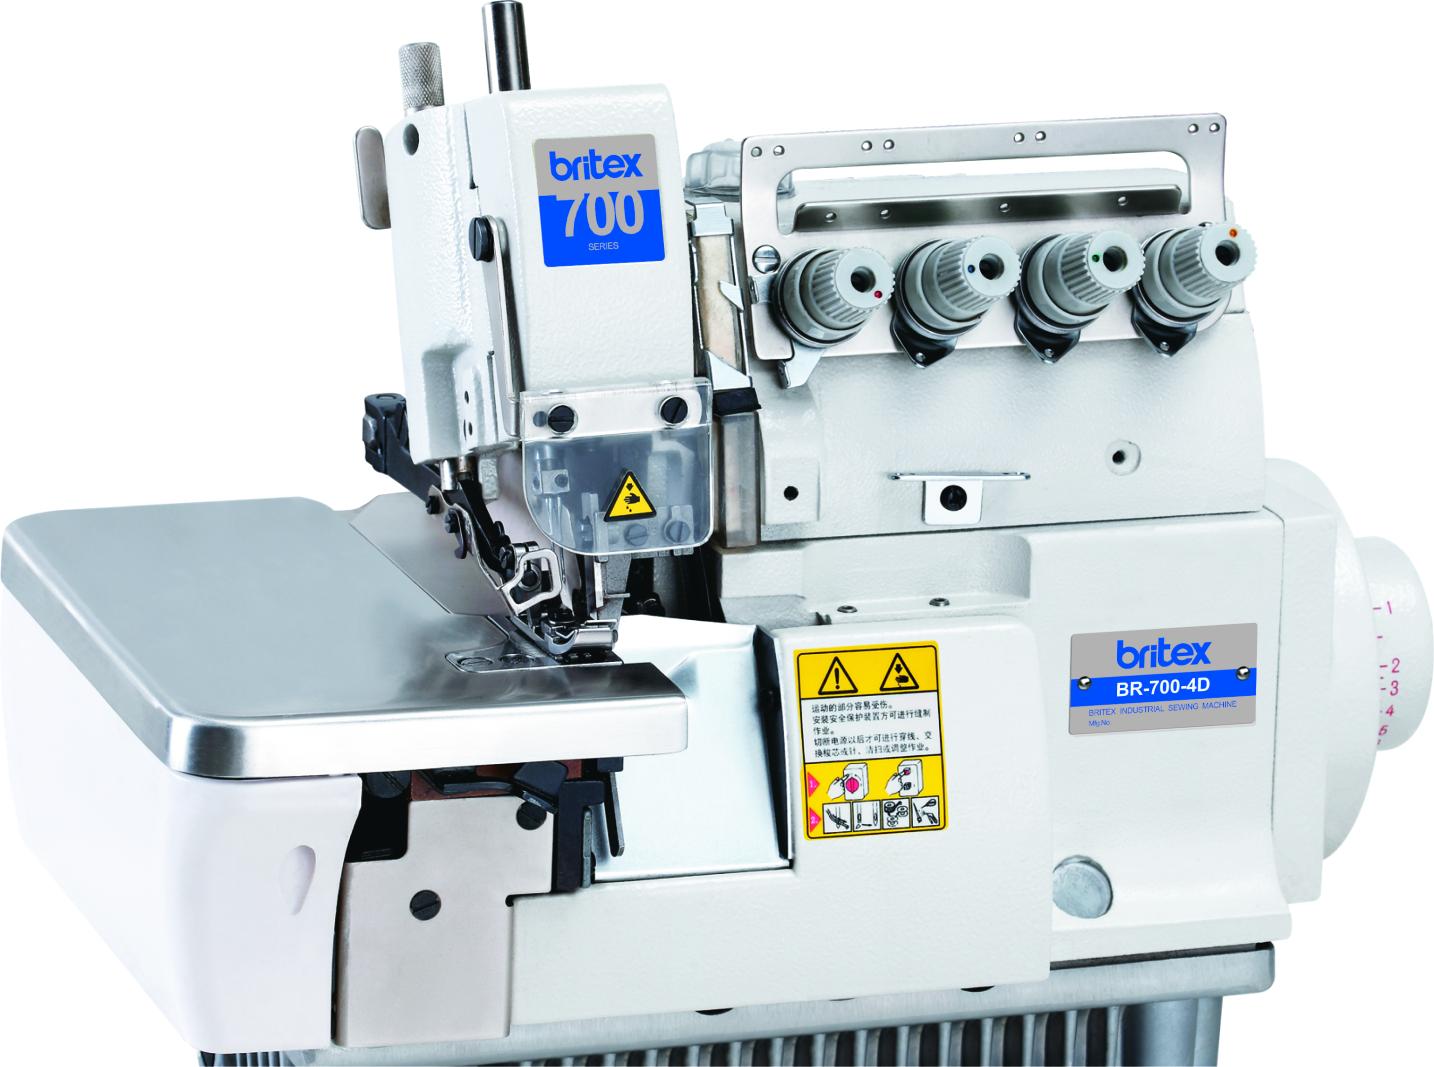 Five Thread High Speed Direct drive Overlock stitch Sewing machine - Britex Brand, Model: BR-700-5D